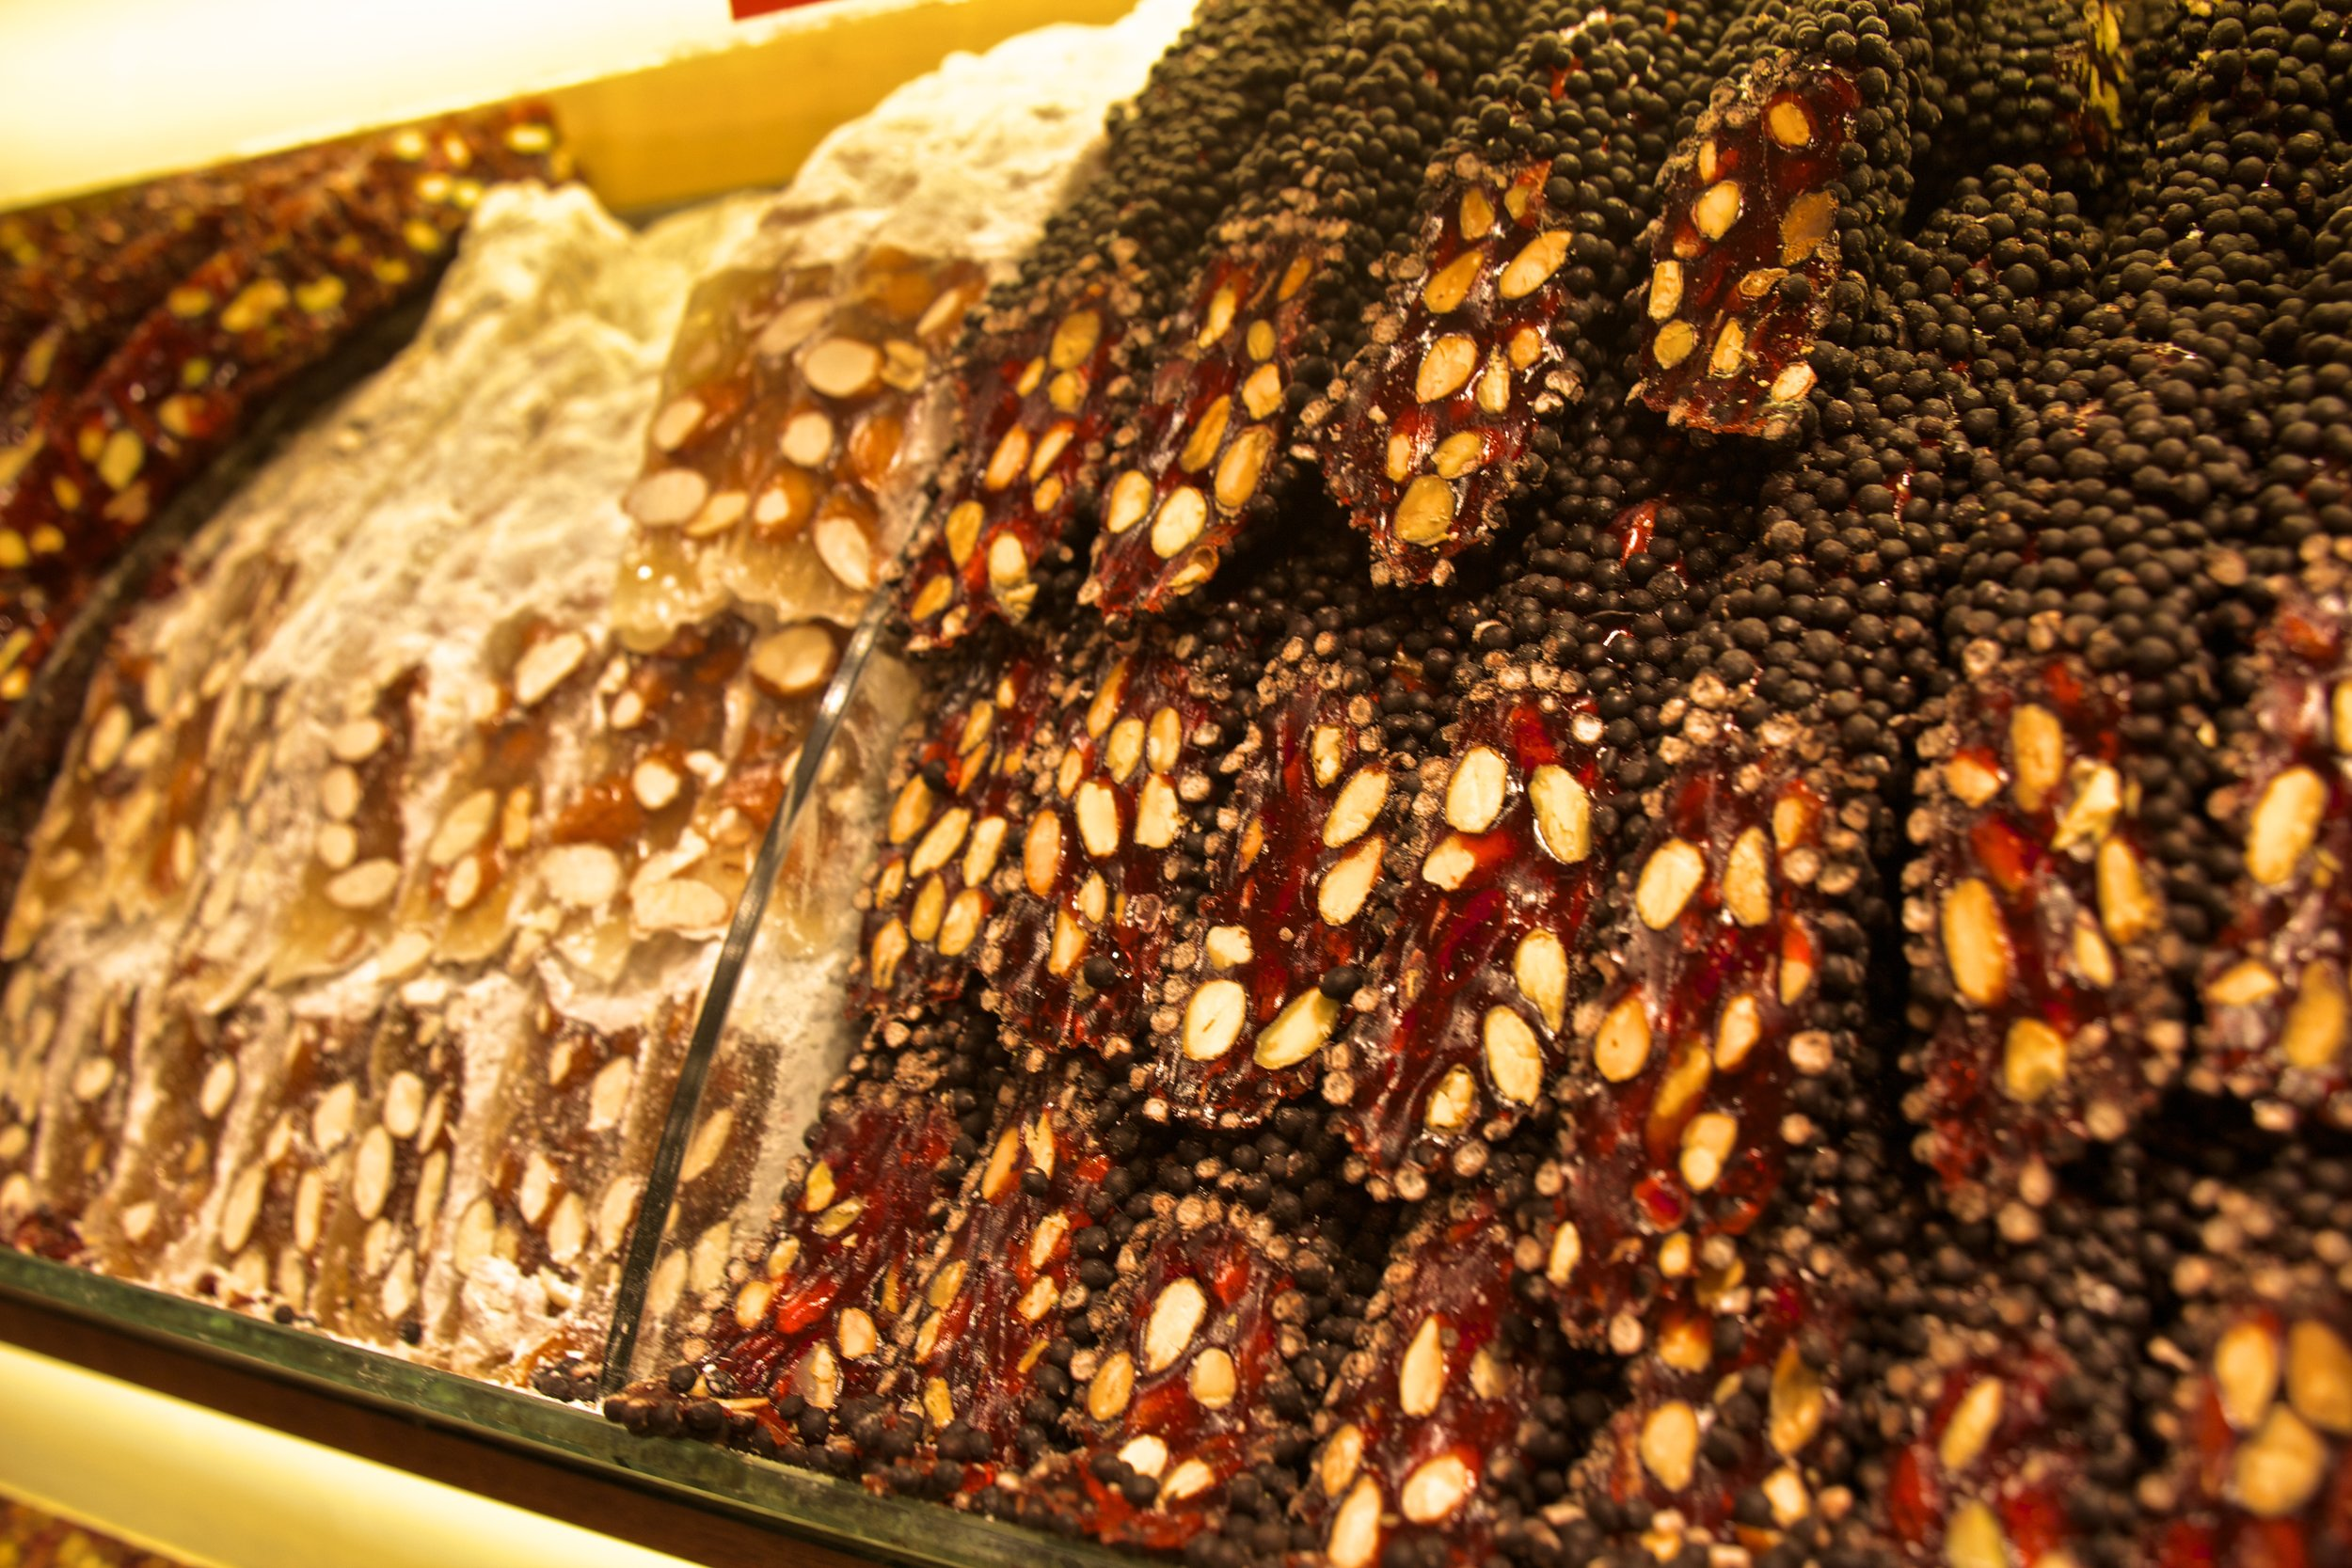 spice bazaar istanbul turkey 3.jpg